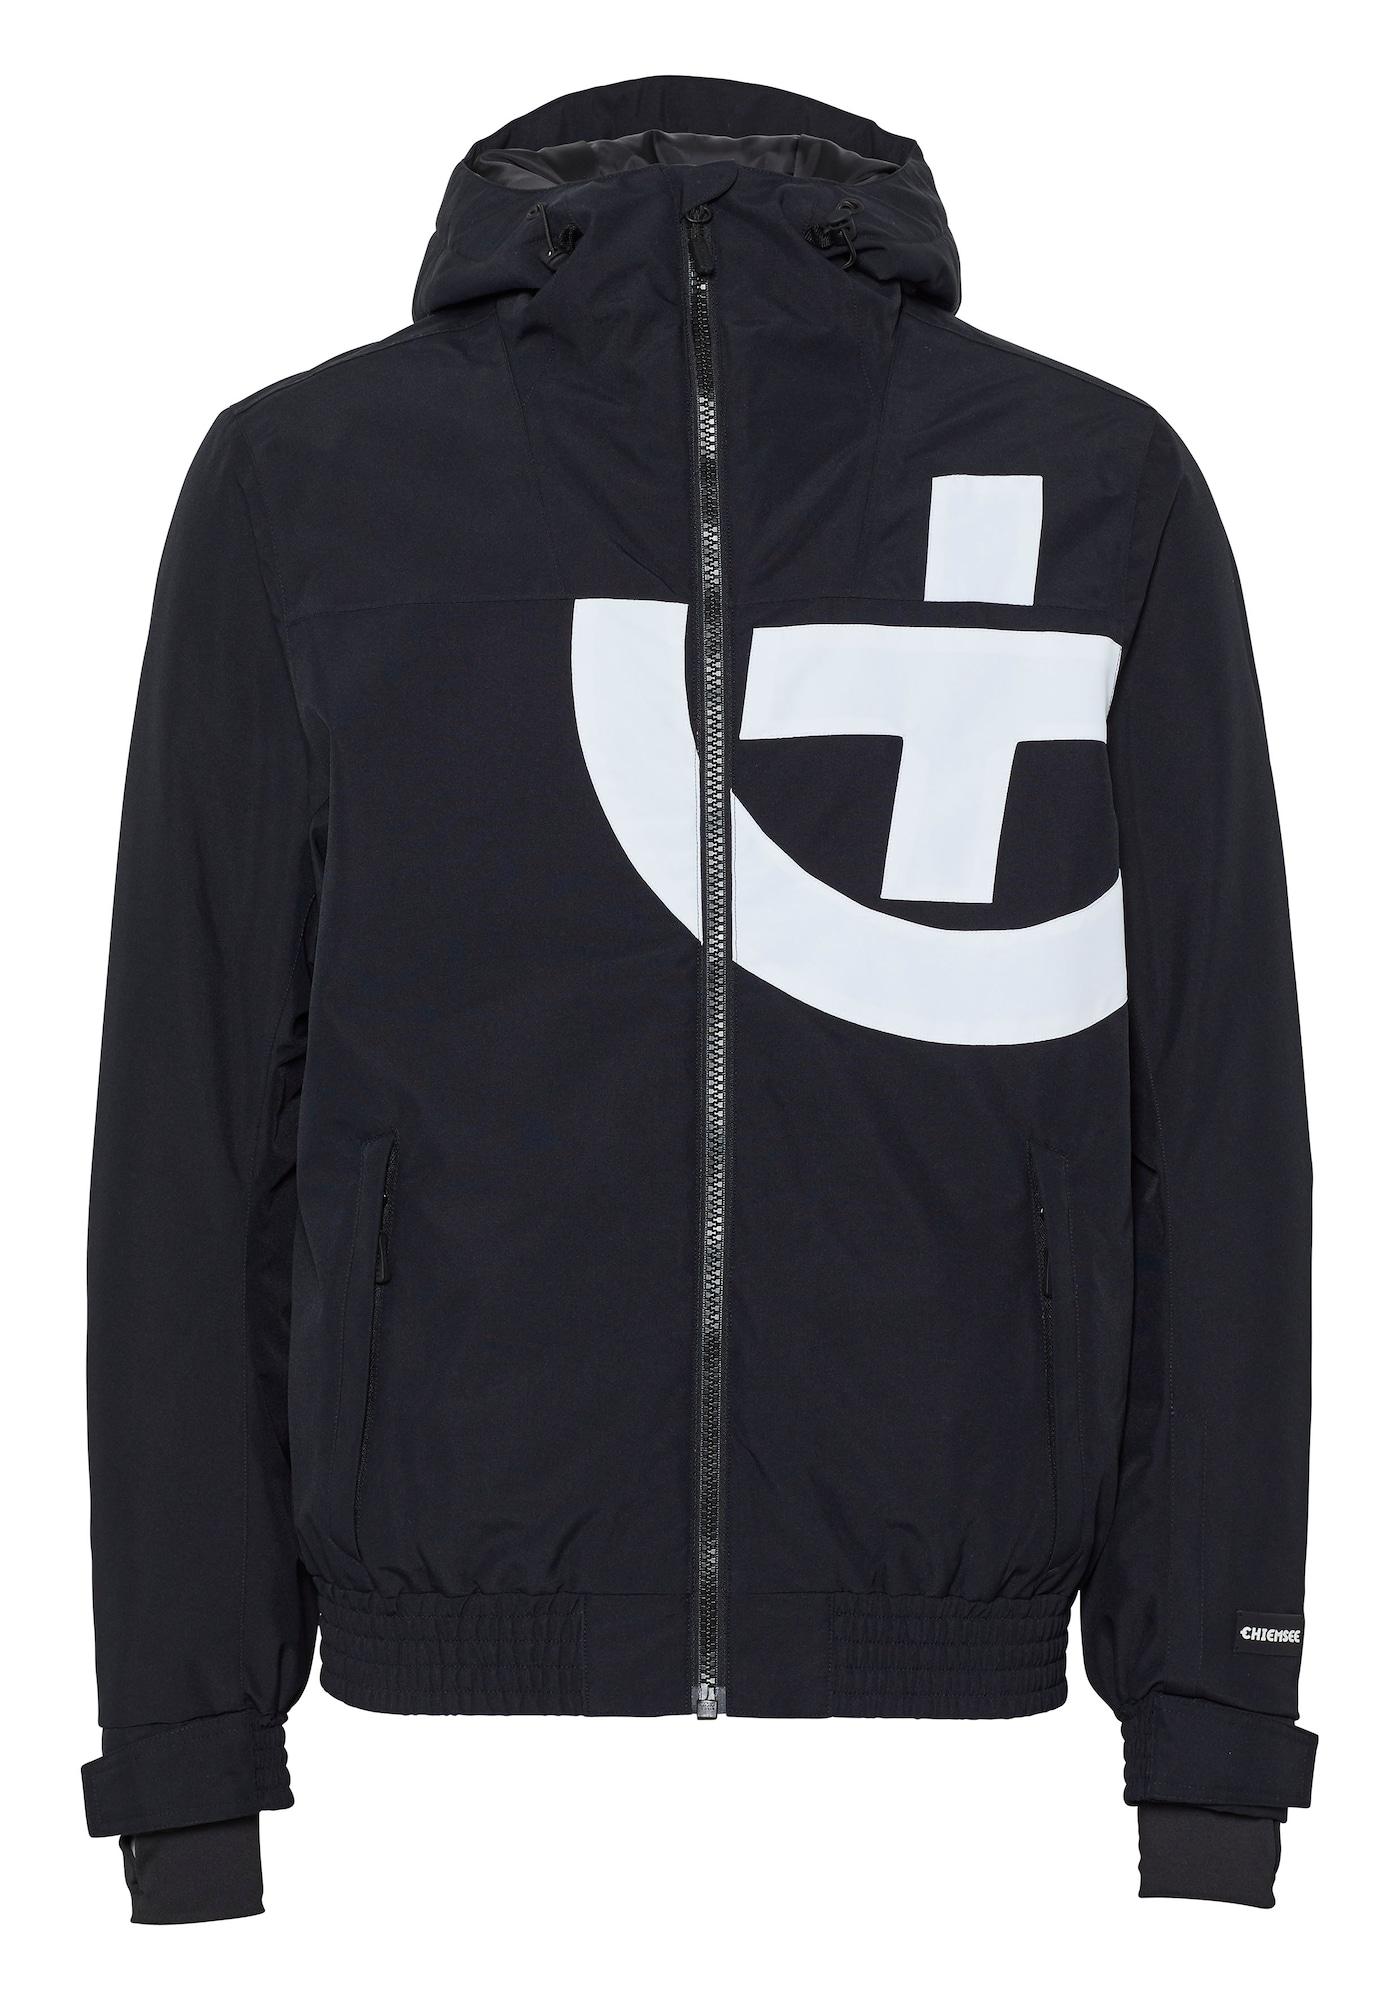 CHIEMSEE Sportovní bunda 'BEAVER CREEK Ski Jacket'  černá / bílá